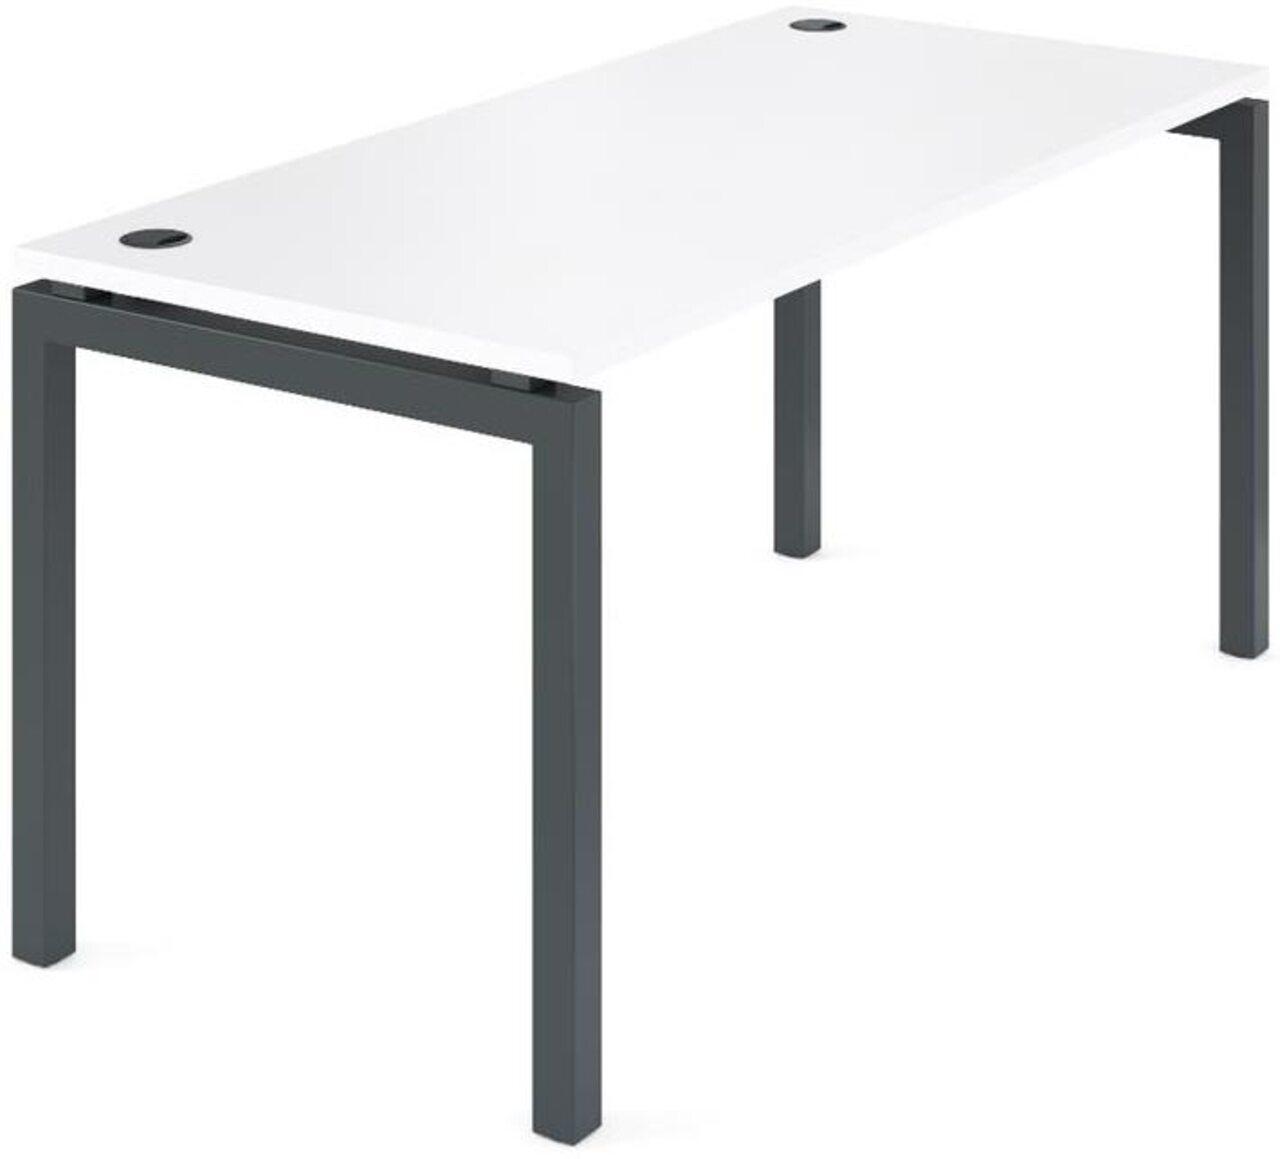 Стол на металлокаркасе  Арго 160x73x76 - фото 1